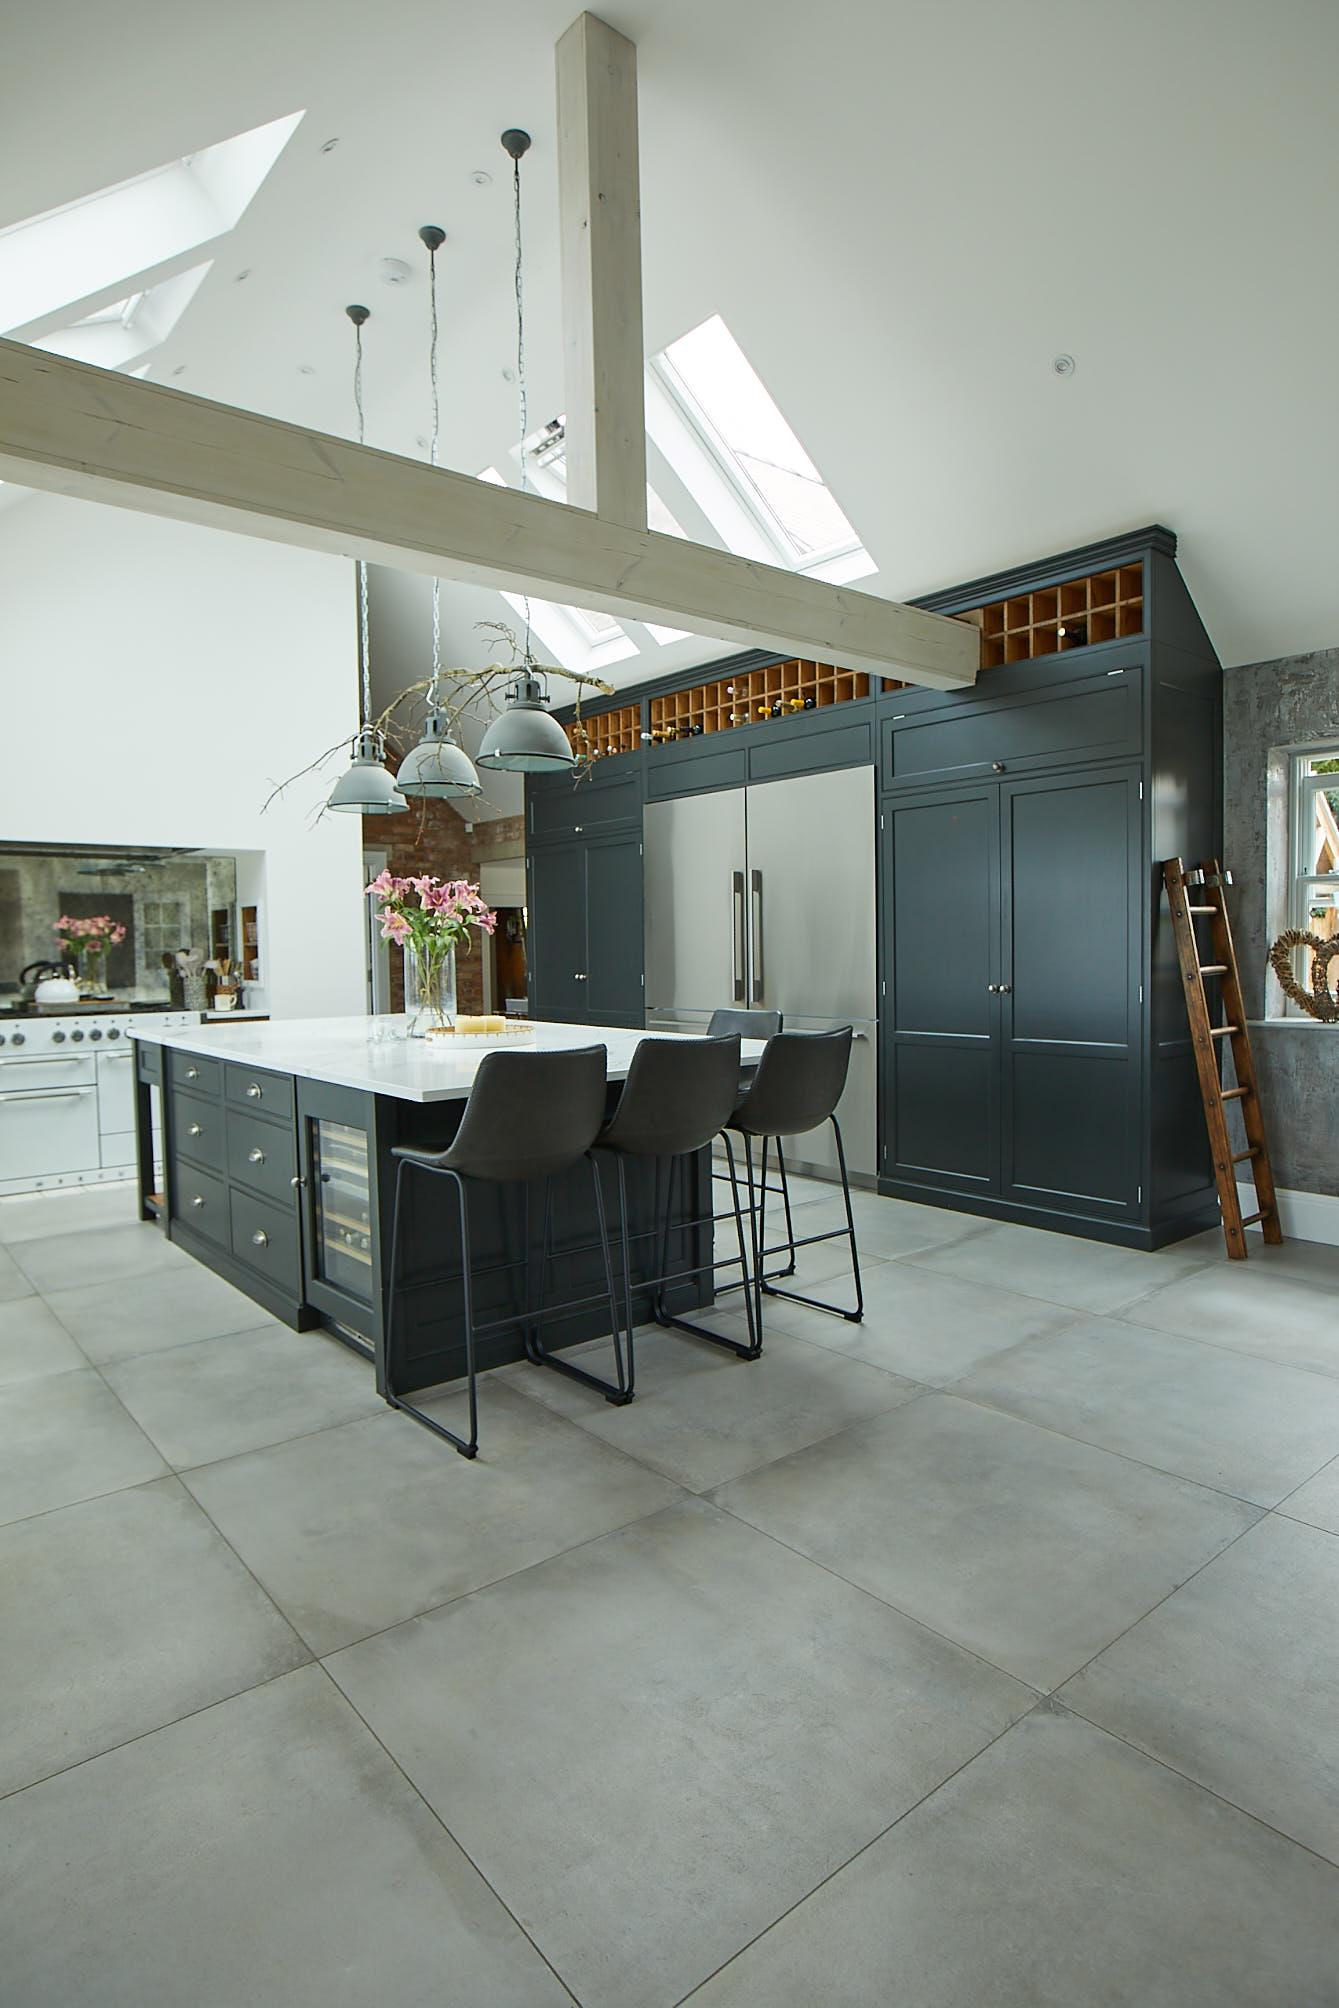 Black painted bespoke island and tall kitchen units